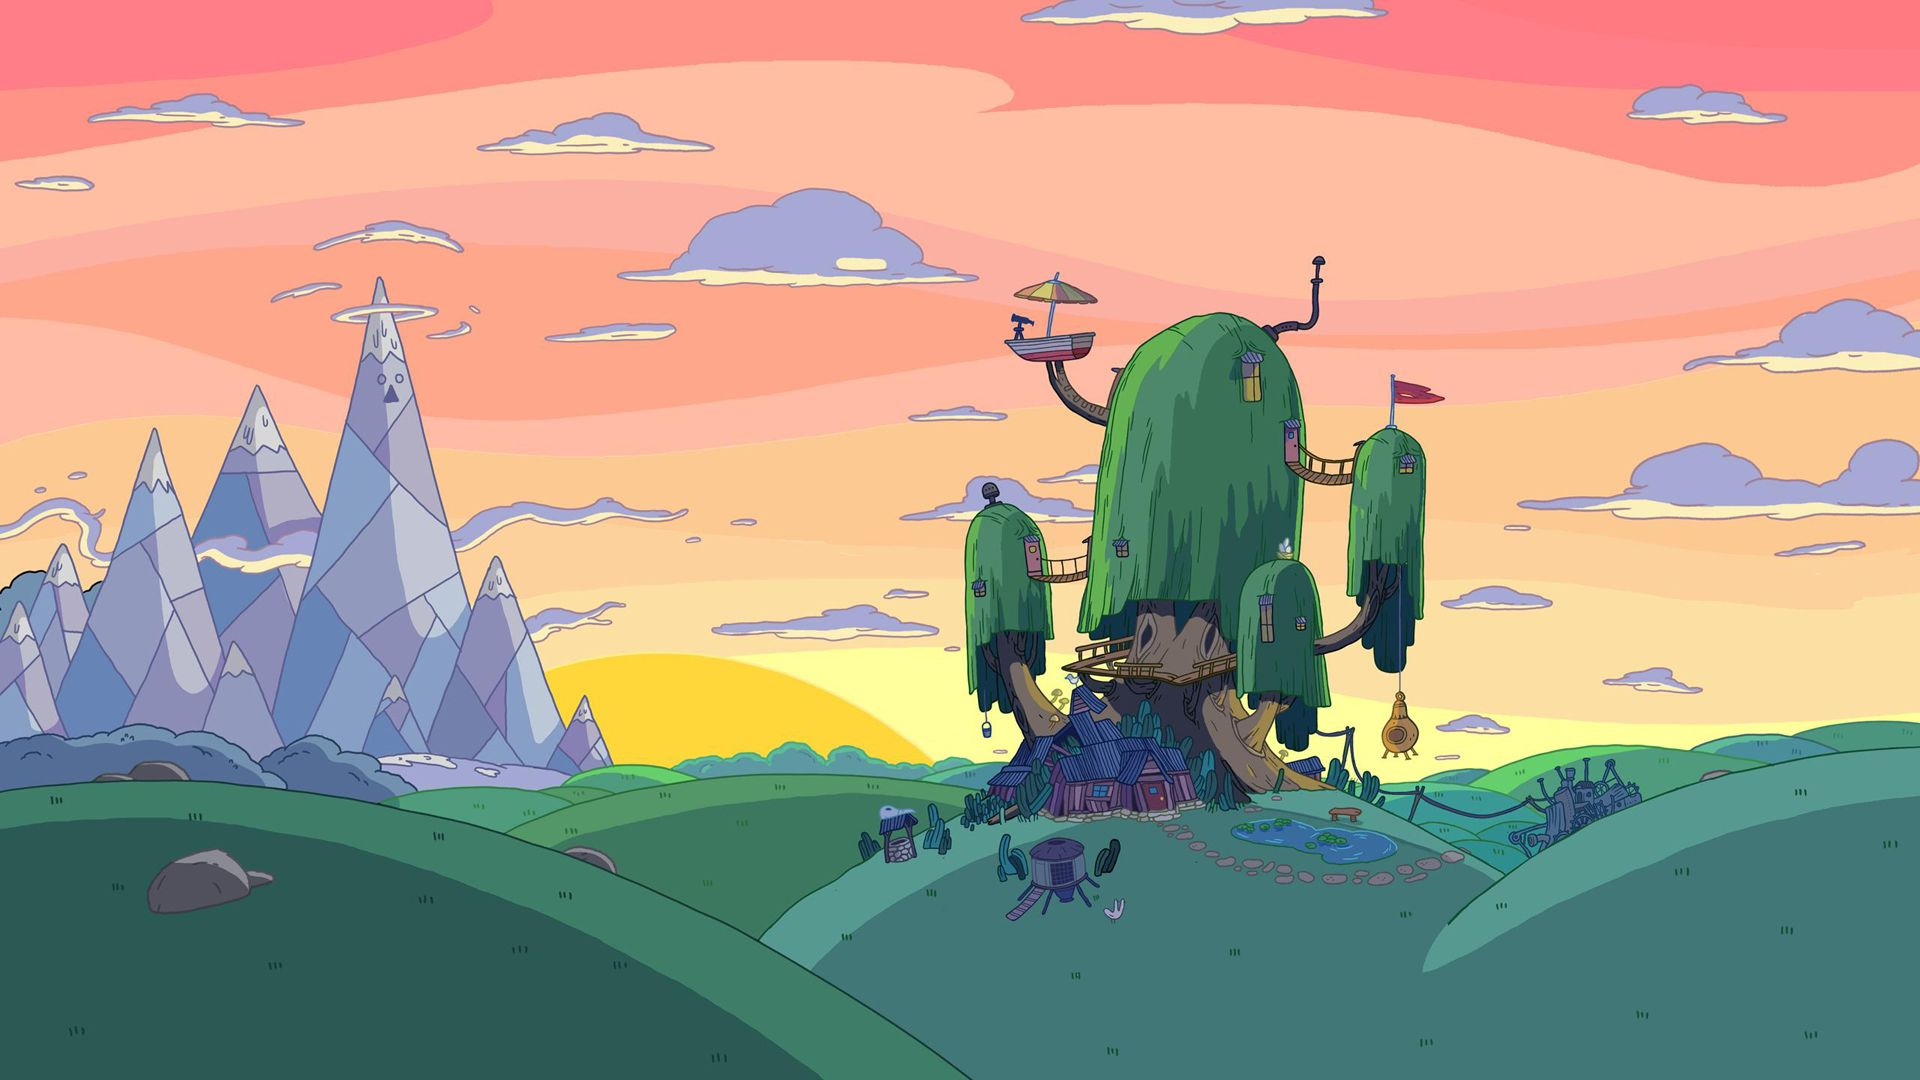 Adventure Time! Adventure time wallpaper, Adventure time